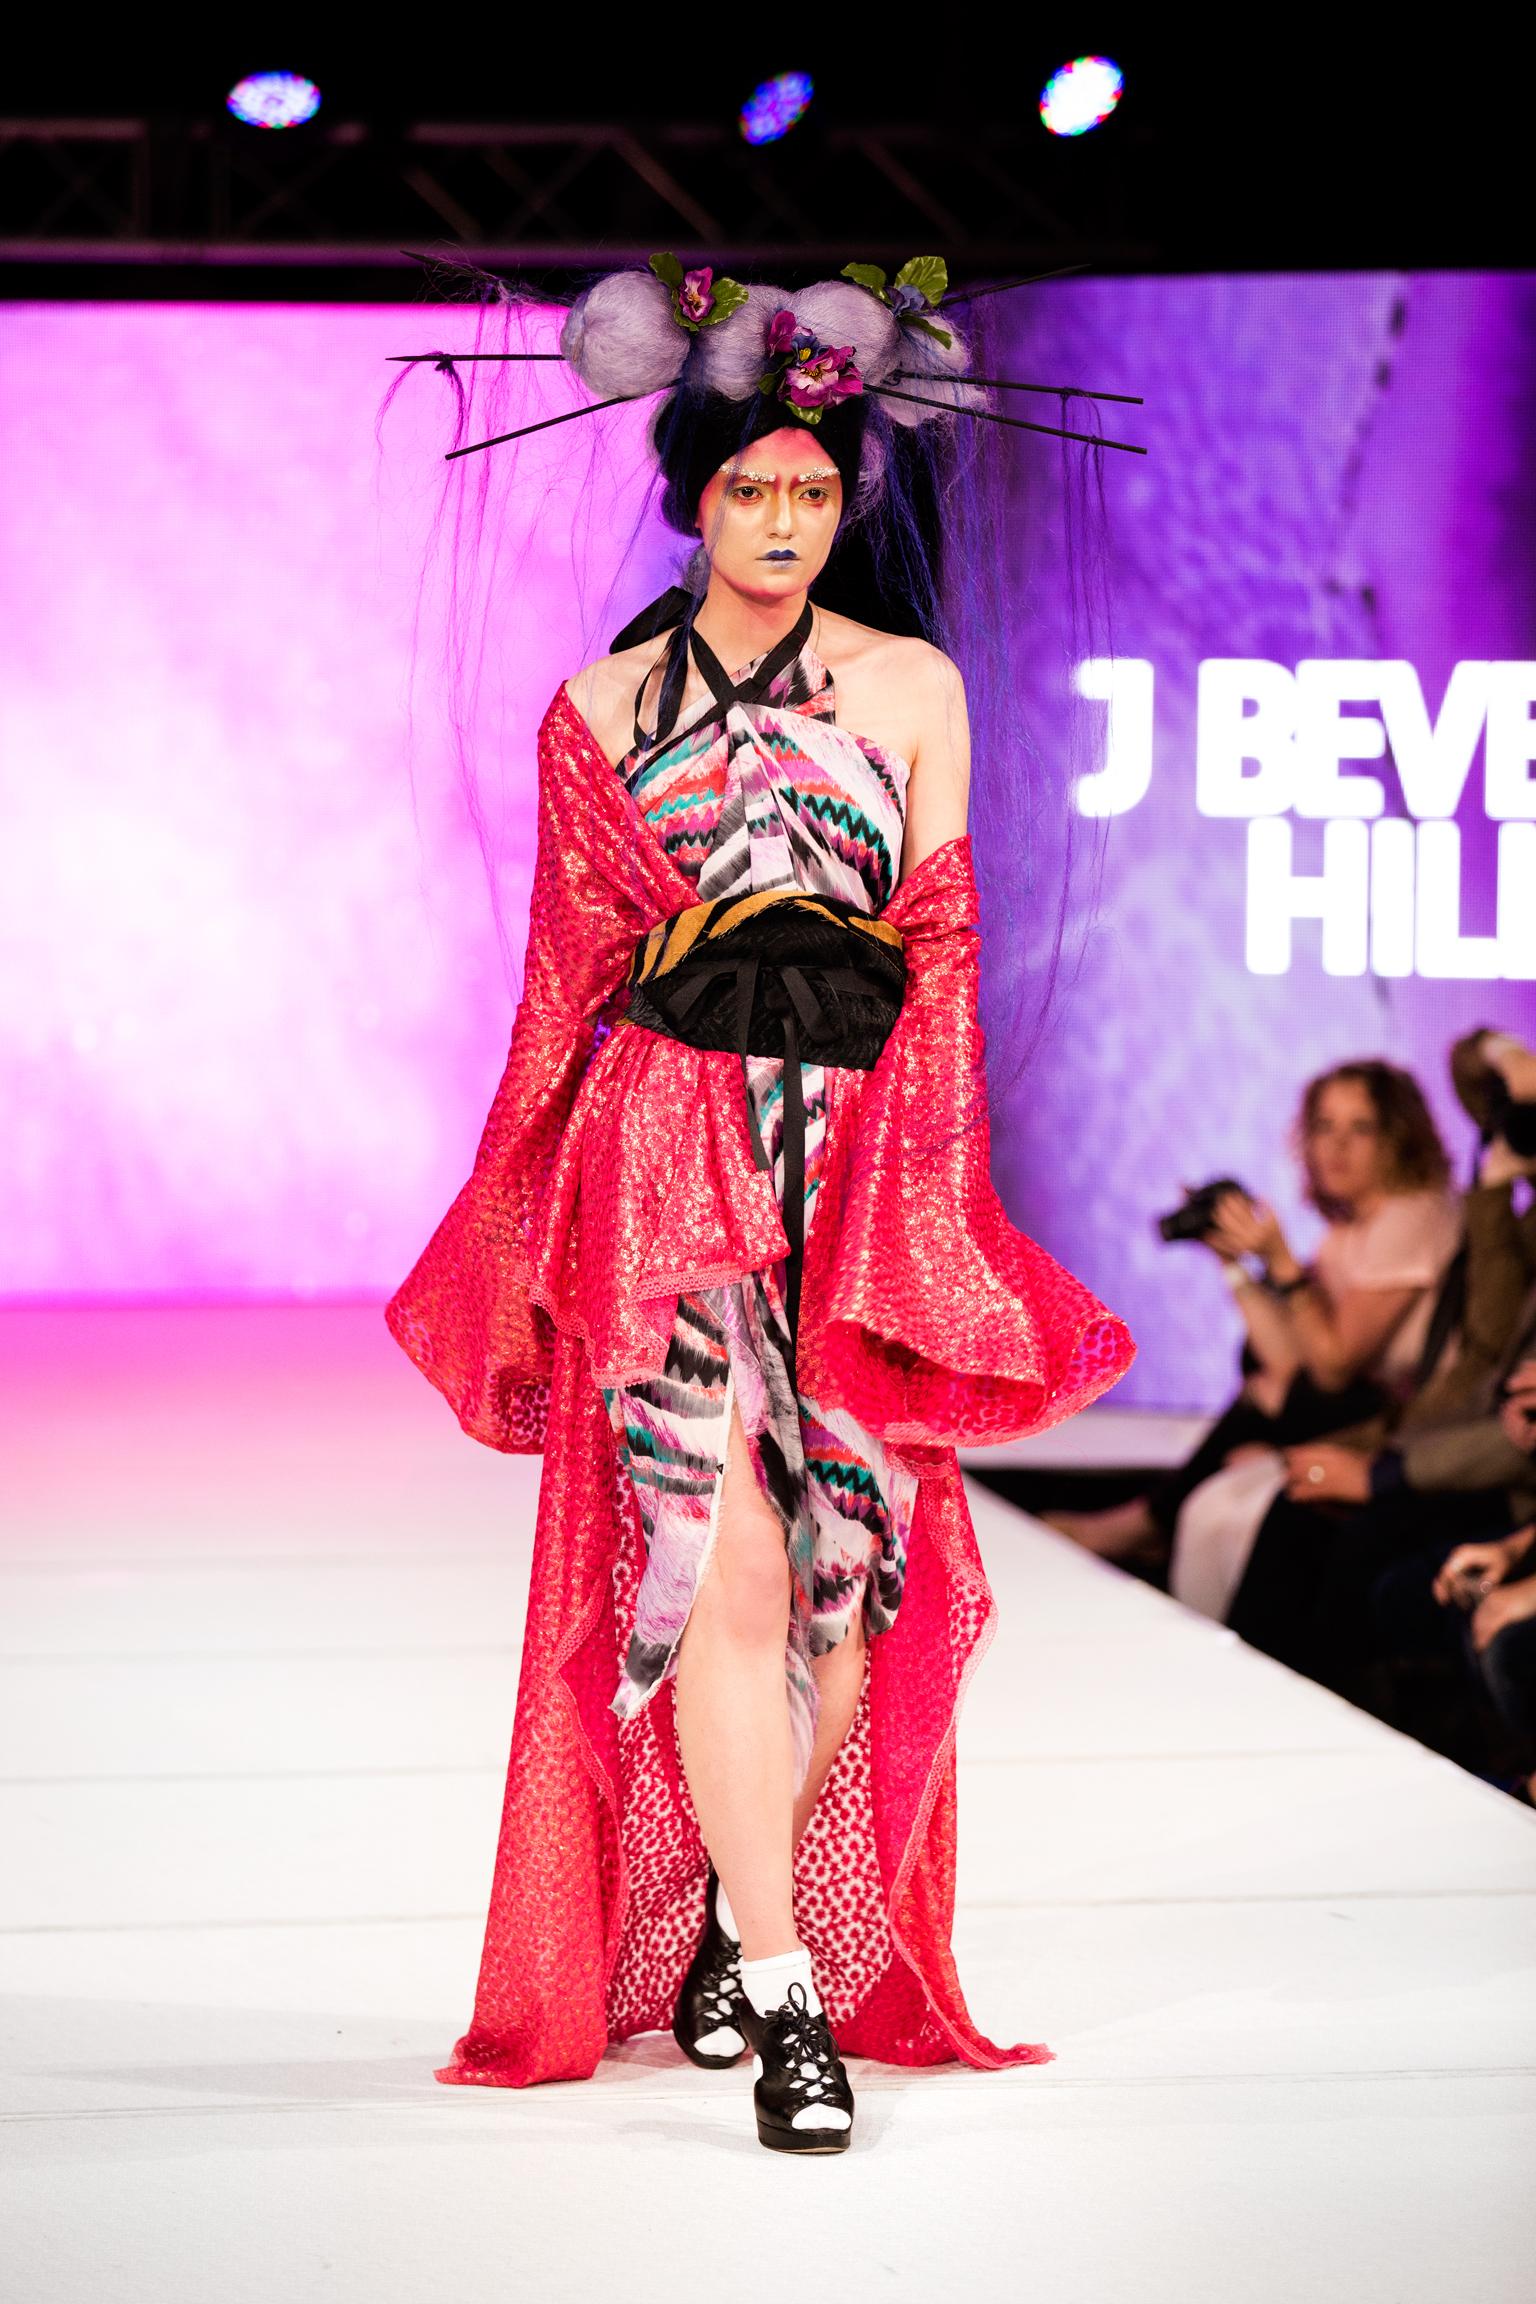 Denver Fashion Week Day 4  J Beverly Hills - 008.jpg